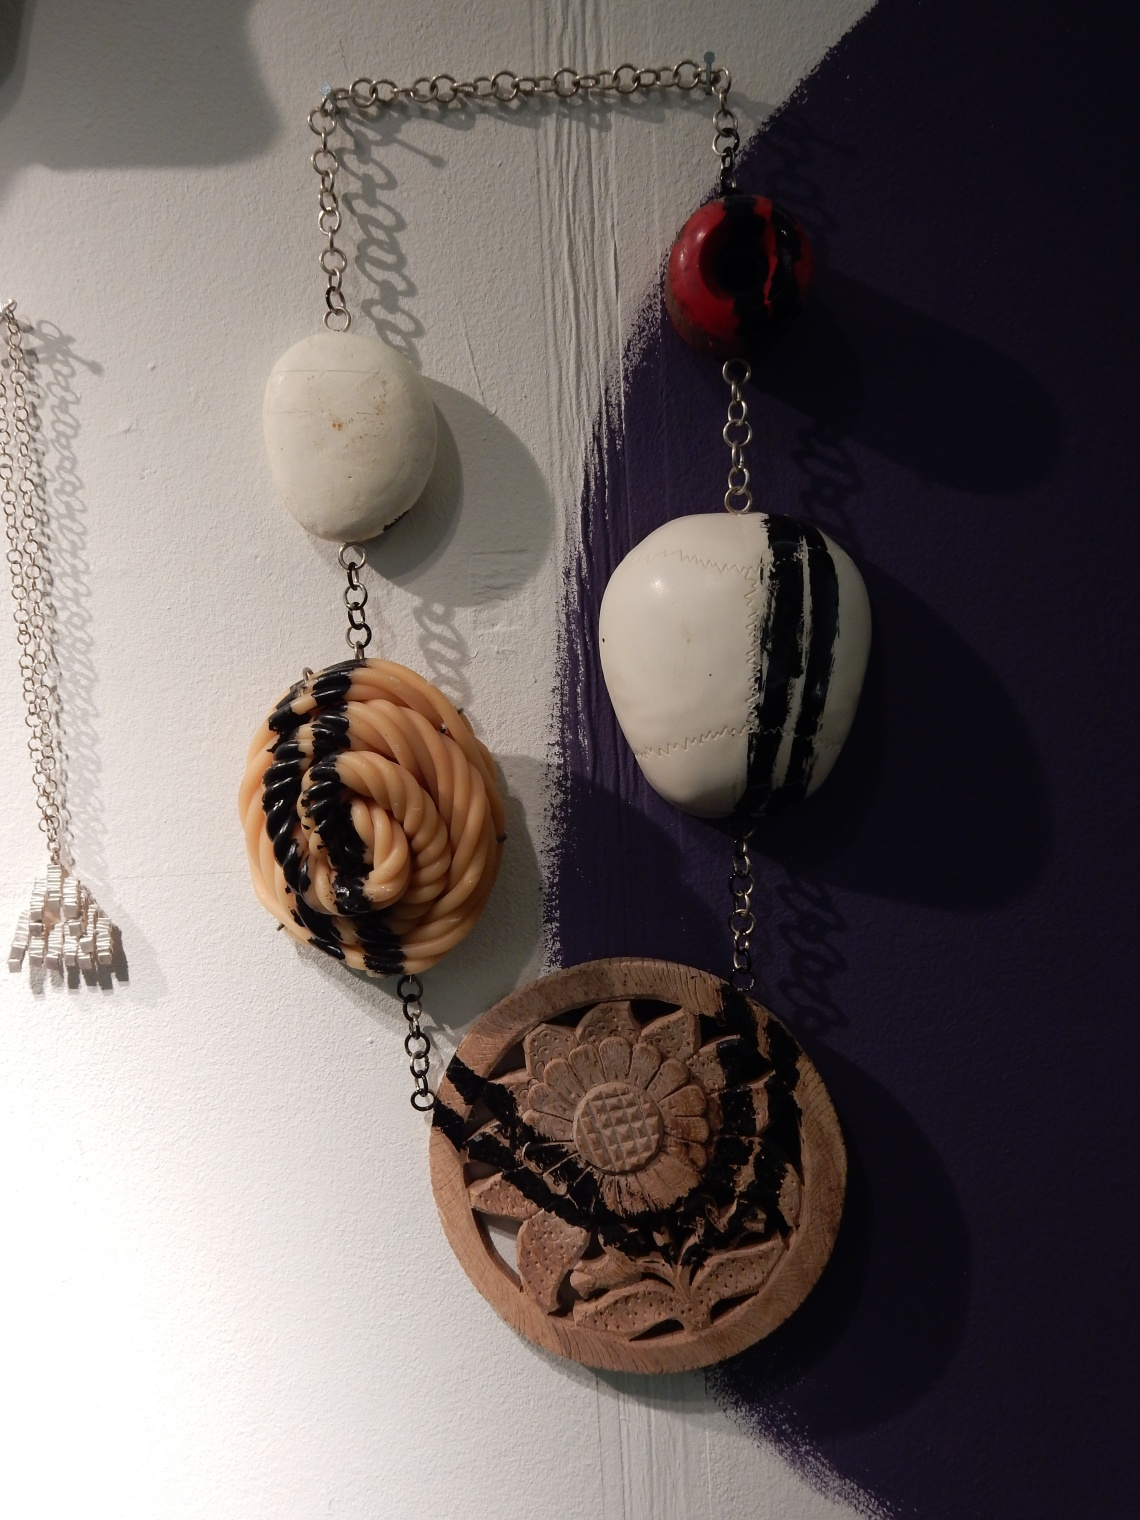 Lisa Walker in Galerie Ra. Foto Esther Doornbusch, december 2018©